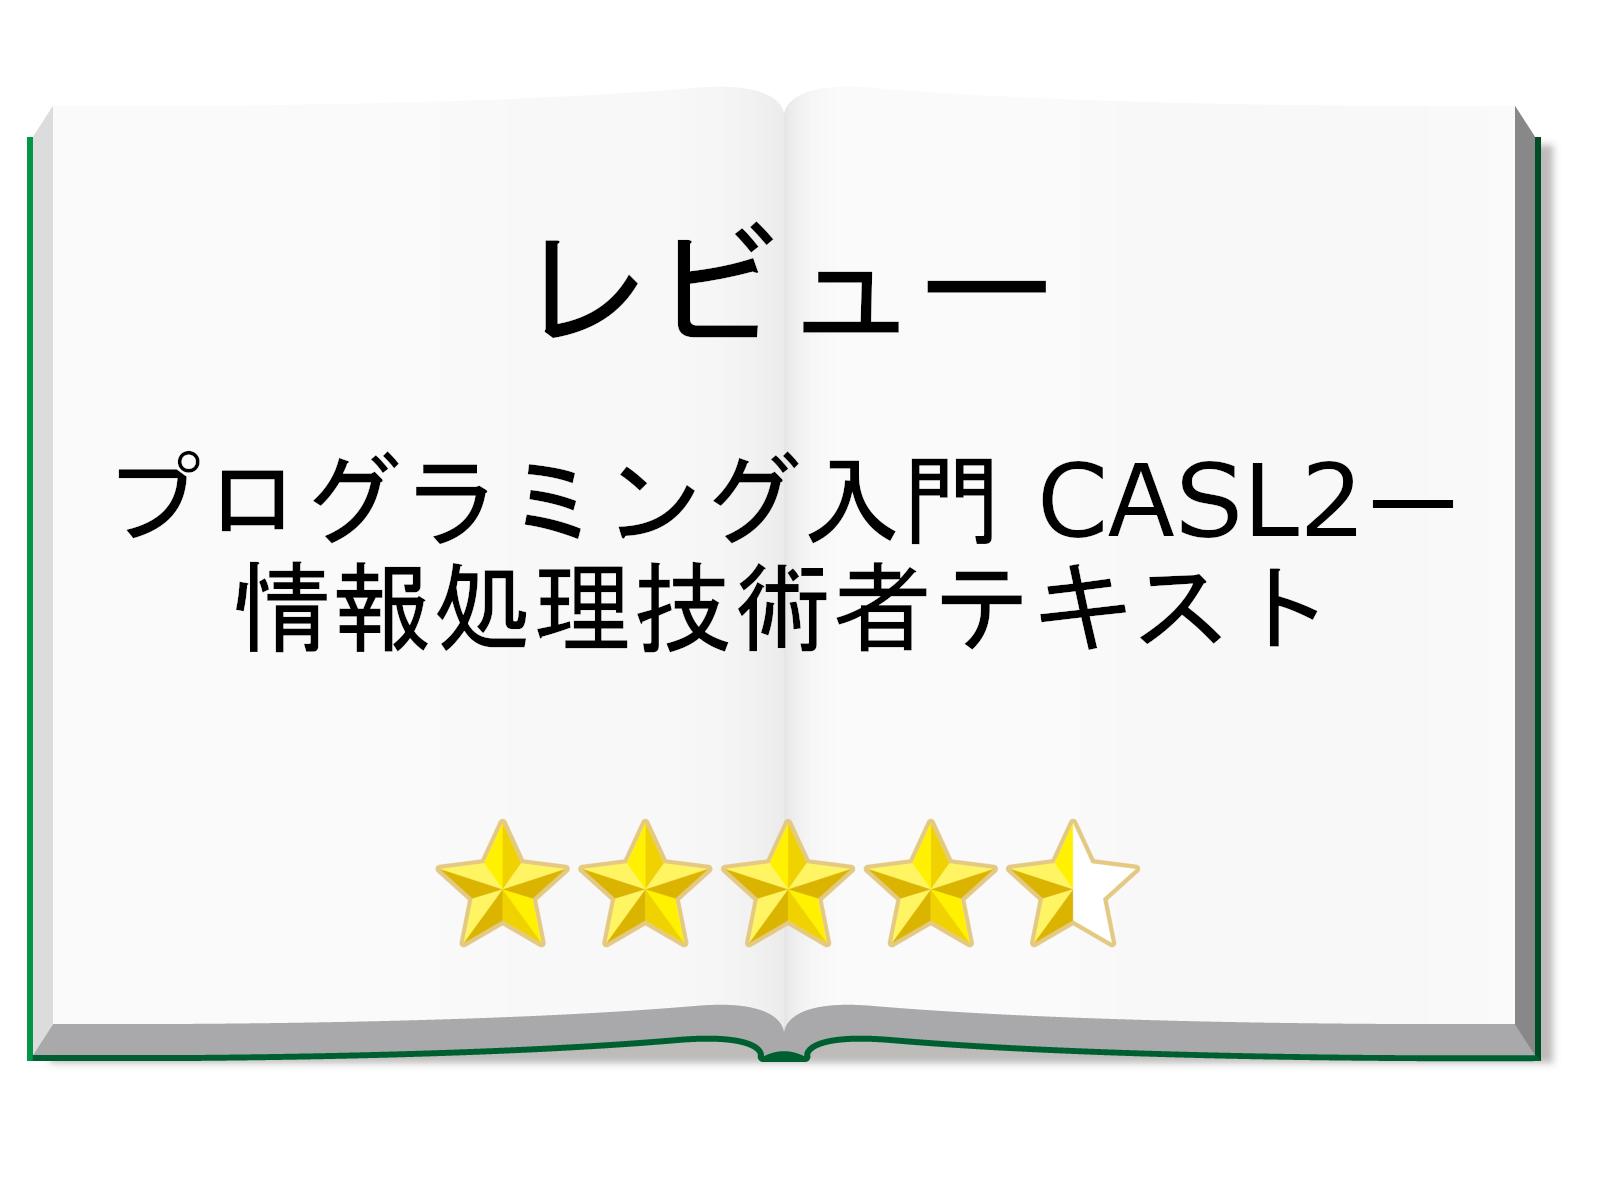 CASL2プログラミング入門 レビュー